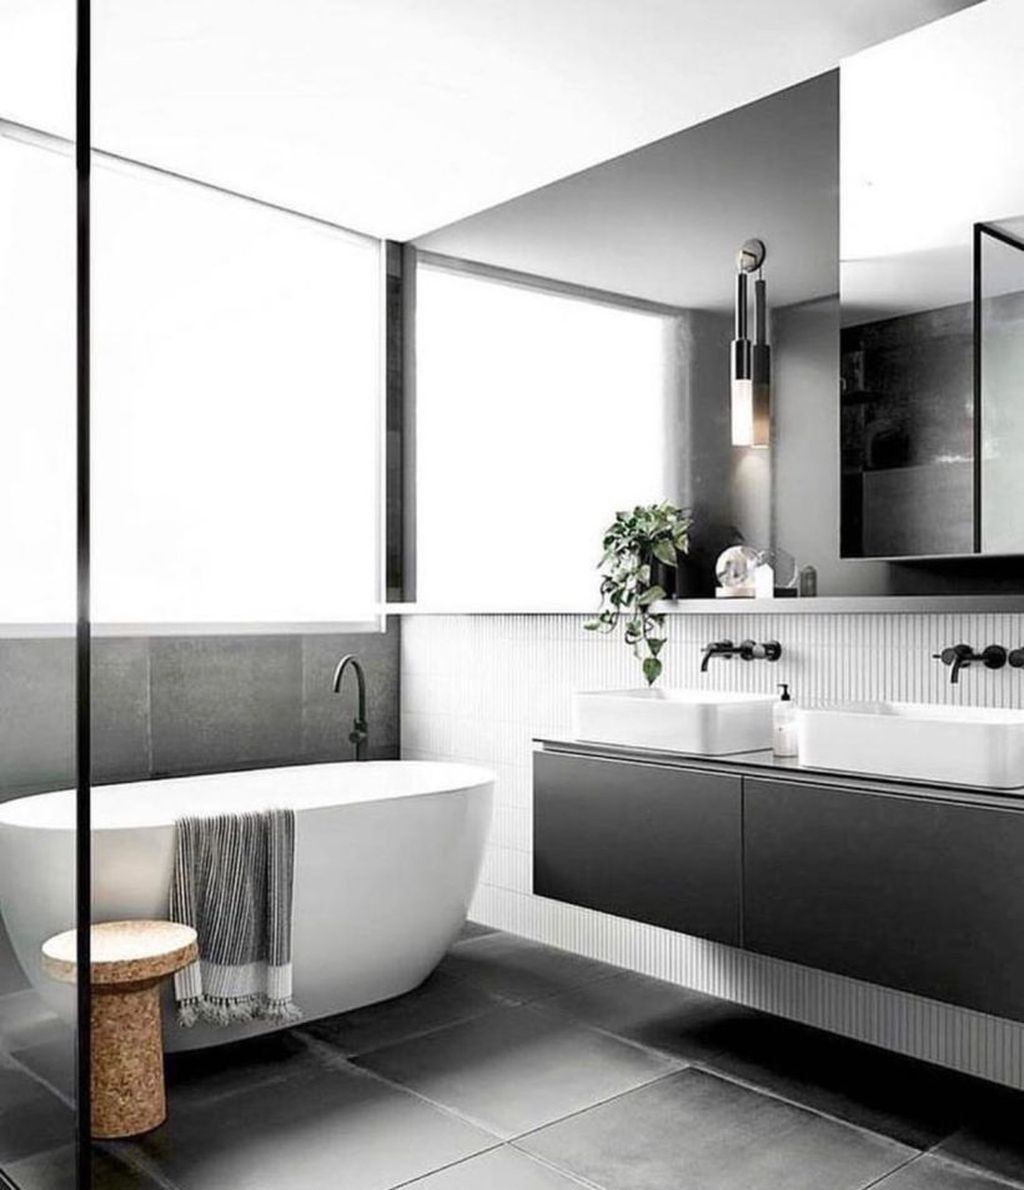 Fabulous Minimalist Bathroom Decor Ideas That Become Everyones Dream 25